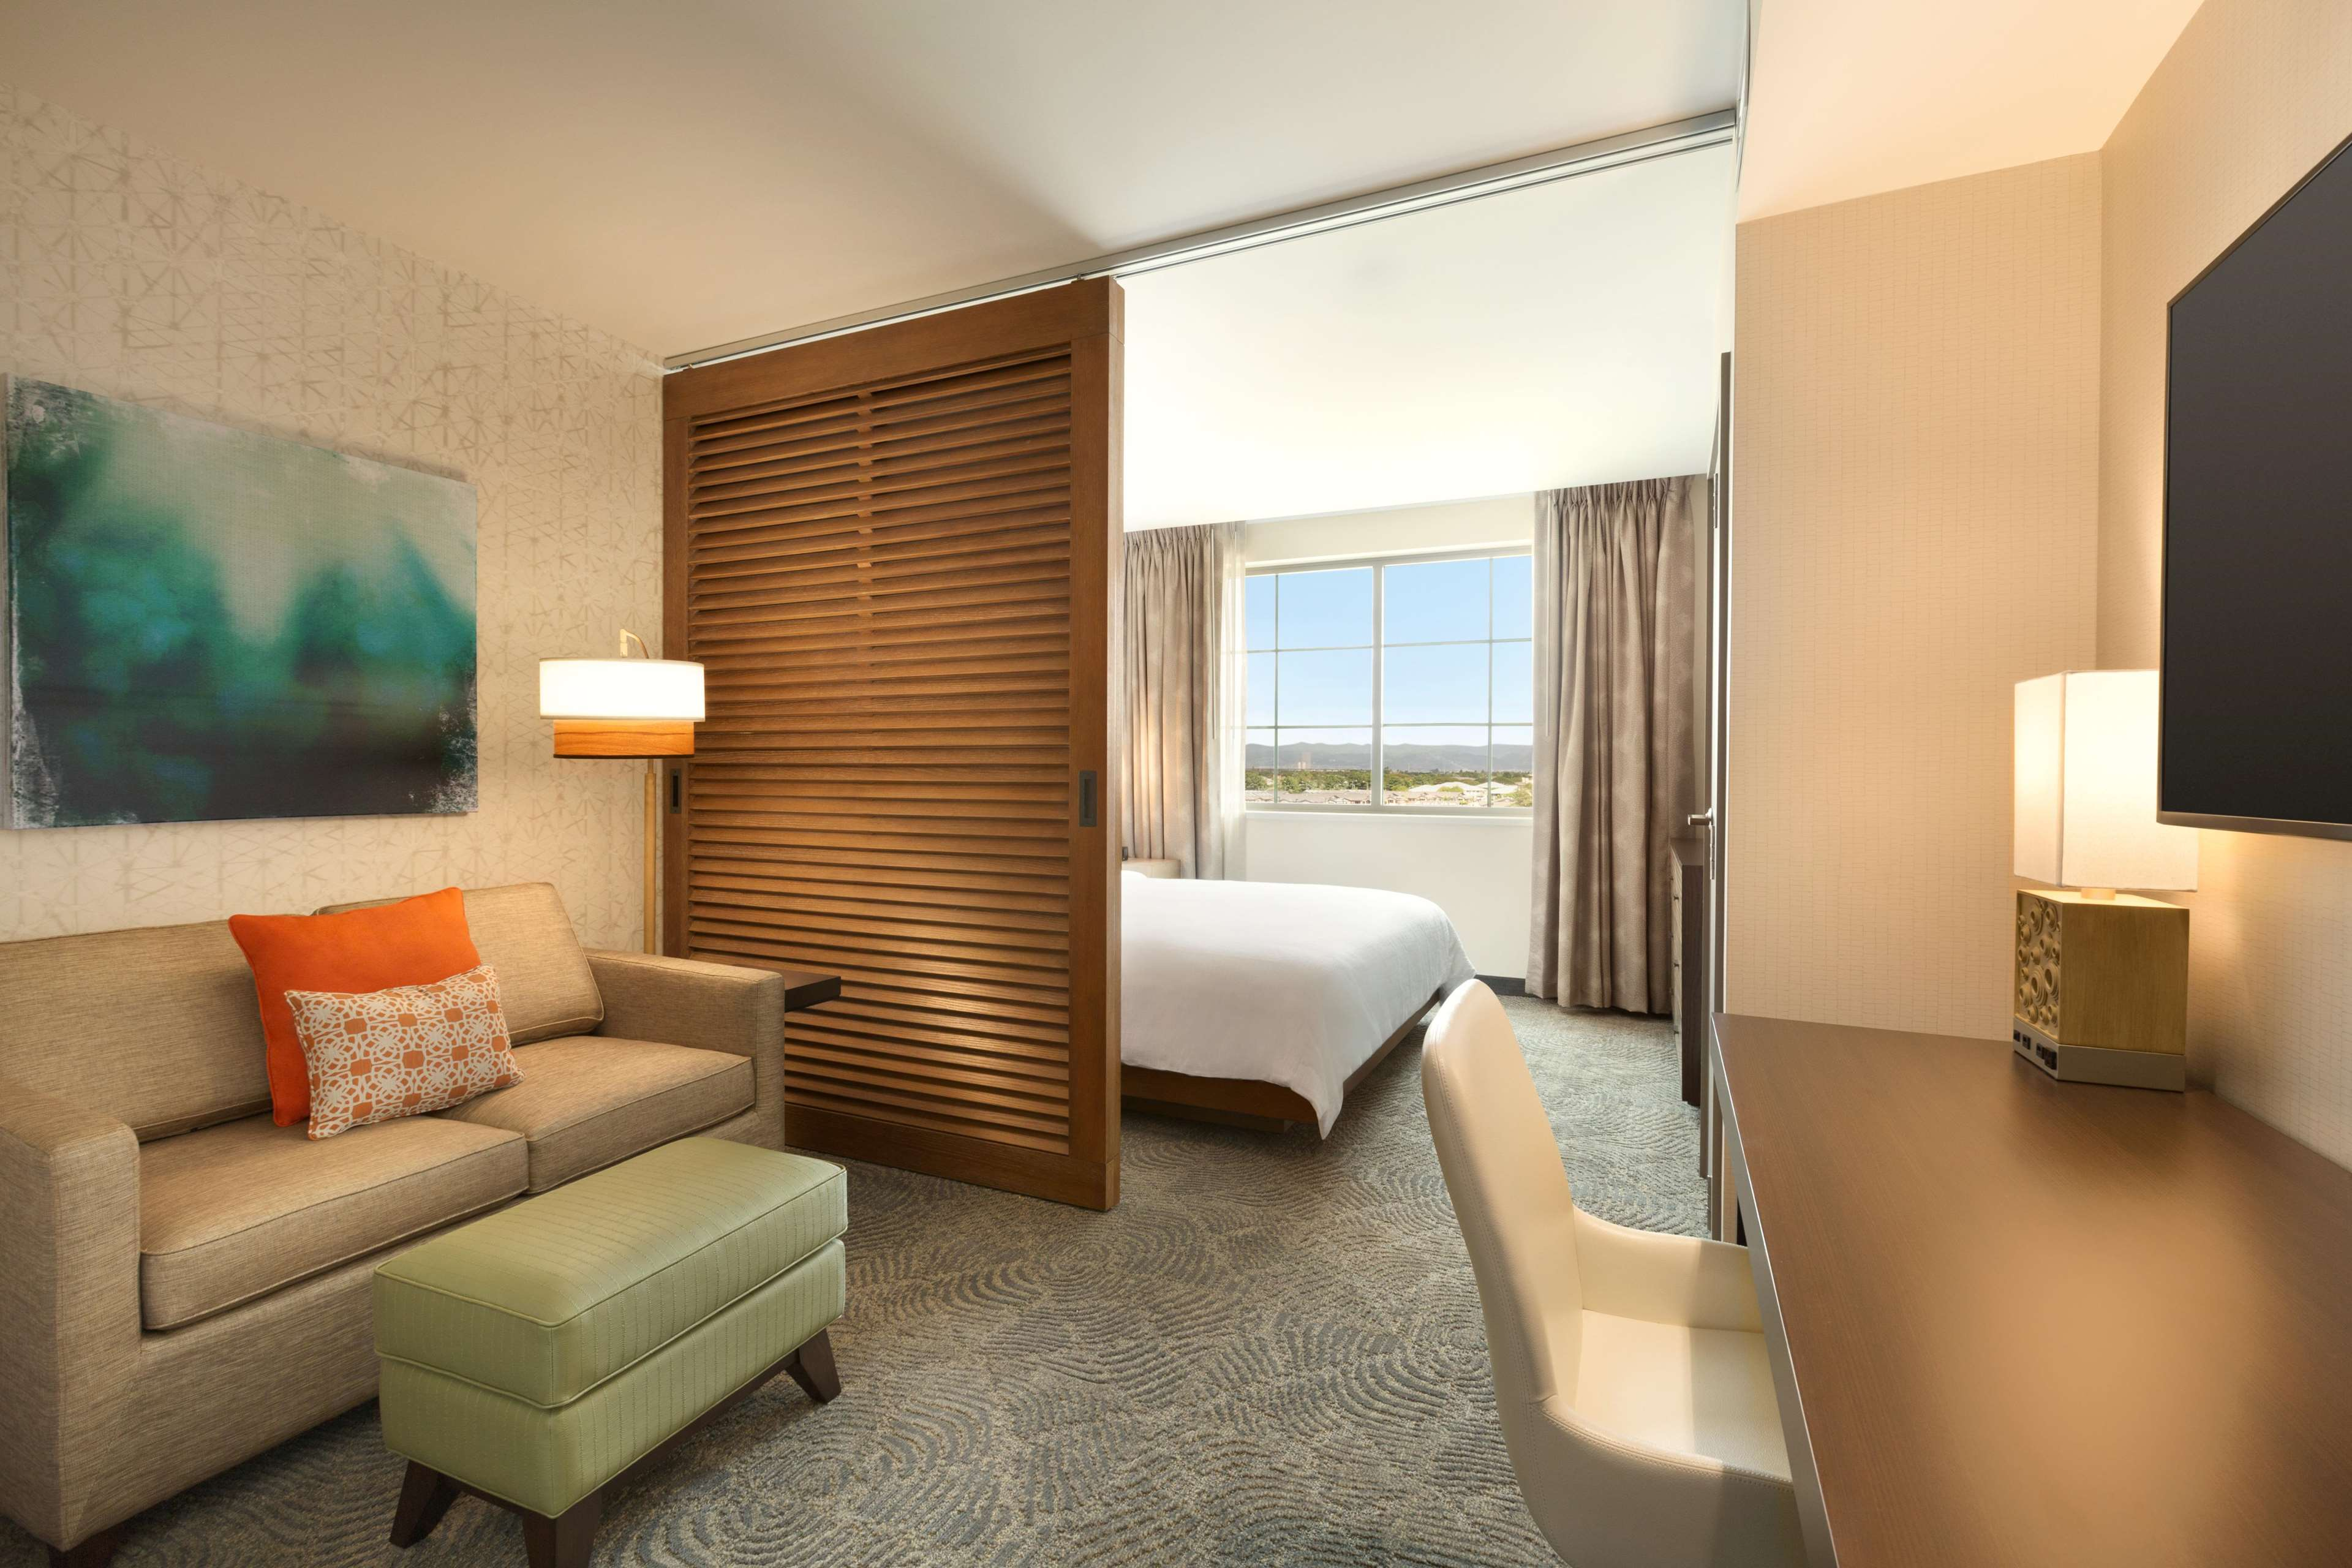 Embassy Suites by Hilton Oahu Kapolei image 29